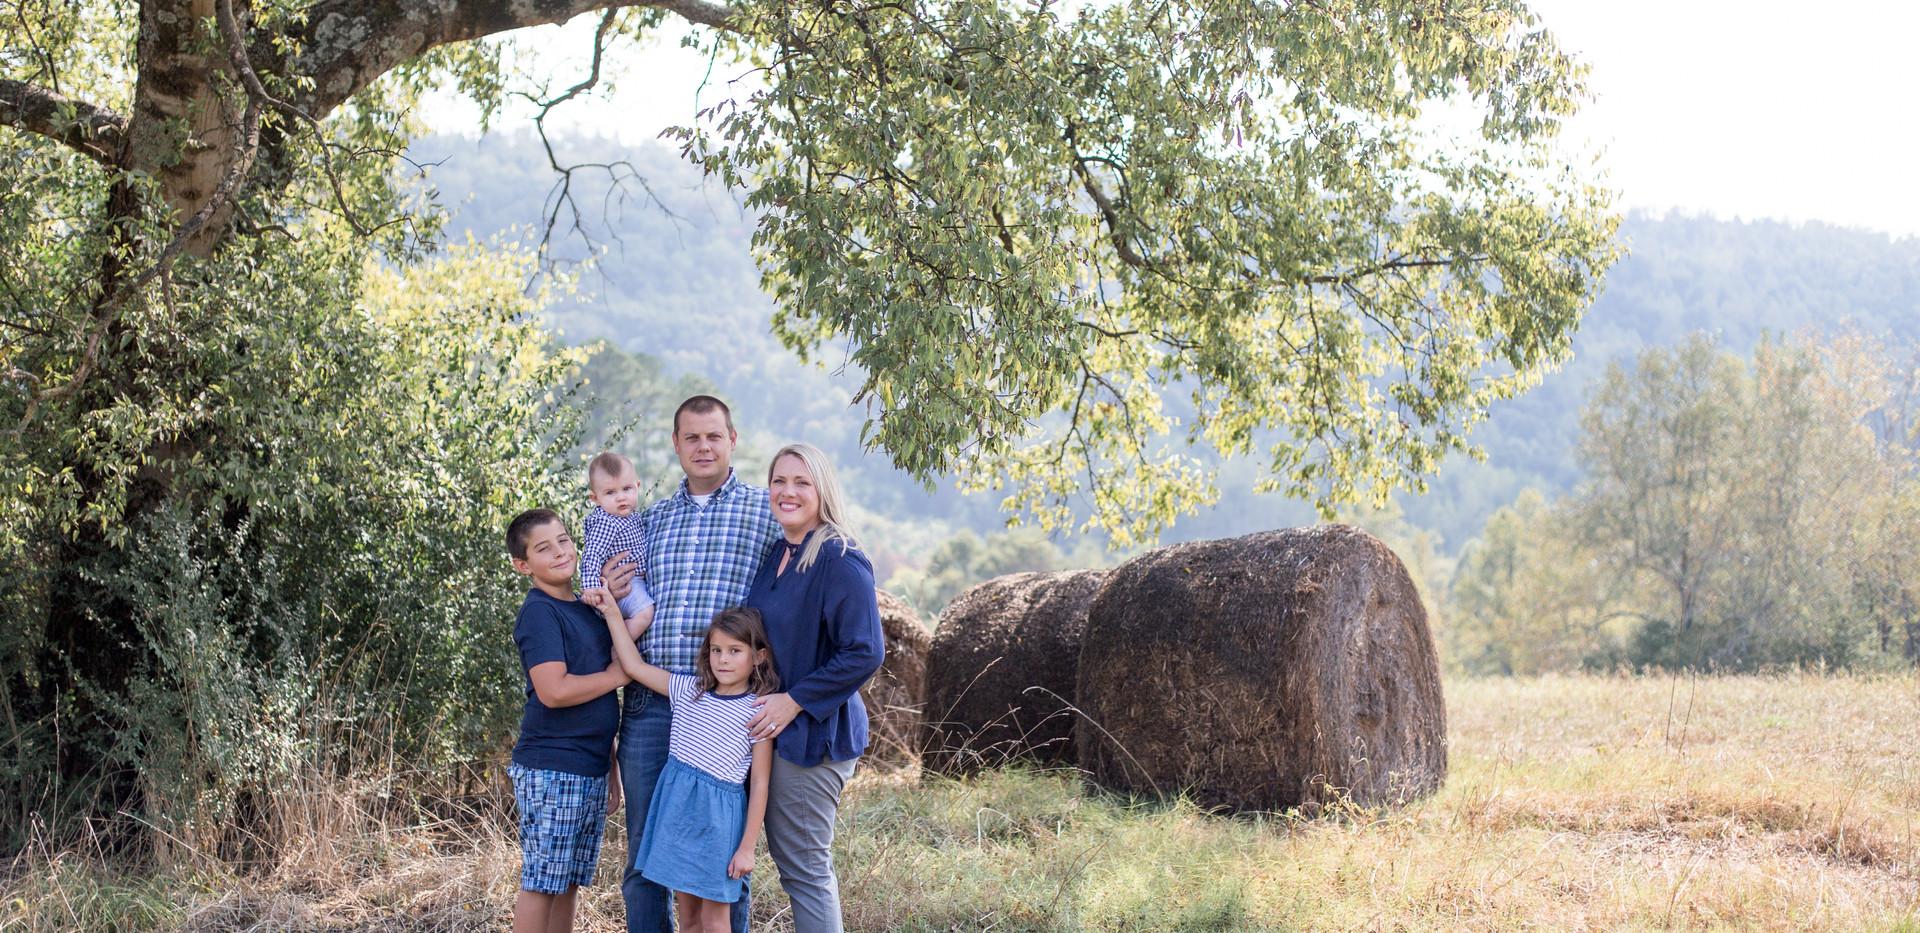 Chattanooga family photo, Chattanooga farm photo, hay bales Chattanooga